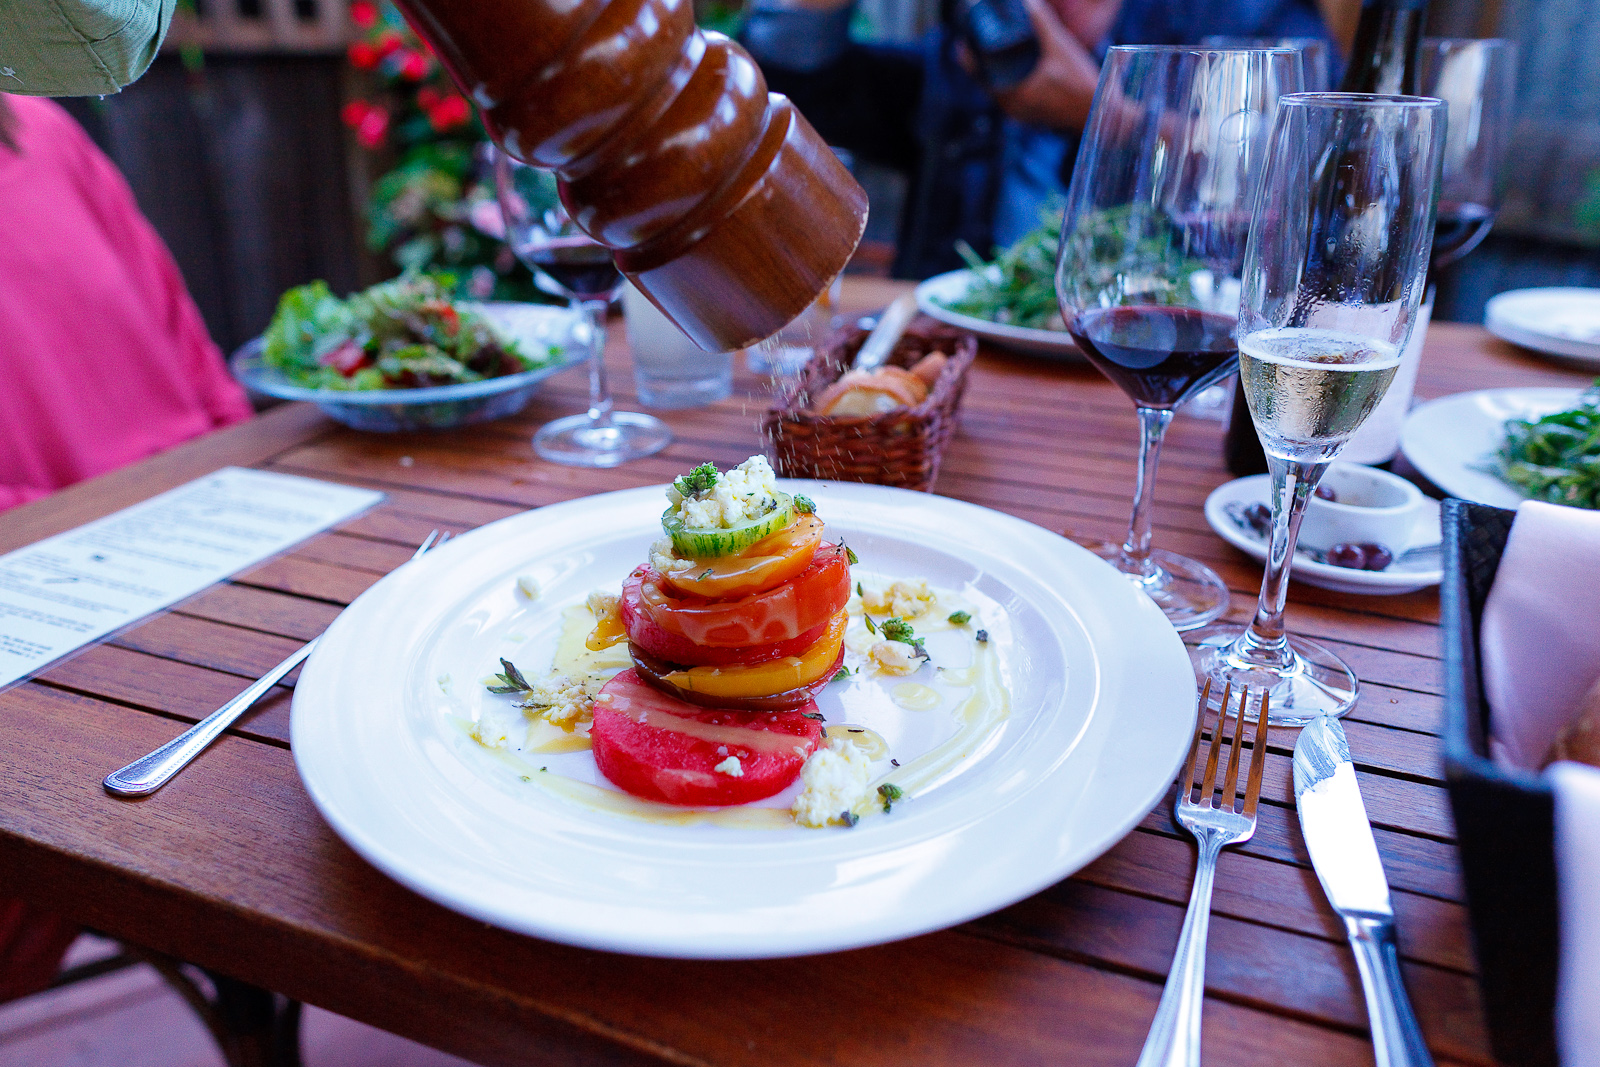 Heirloom tomato & watermelon salad, marinated feta, yellow tomato vinaigrette ($12)